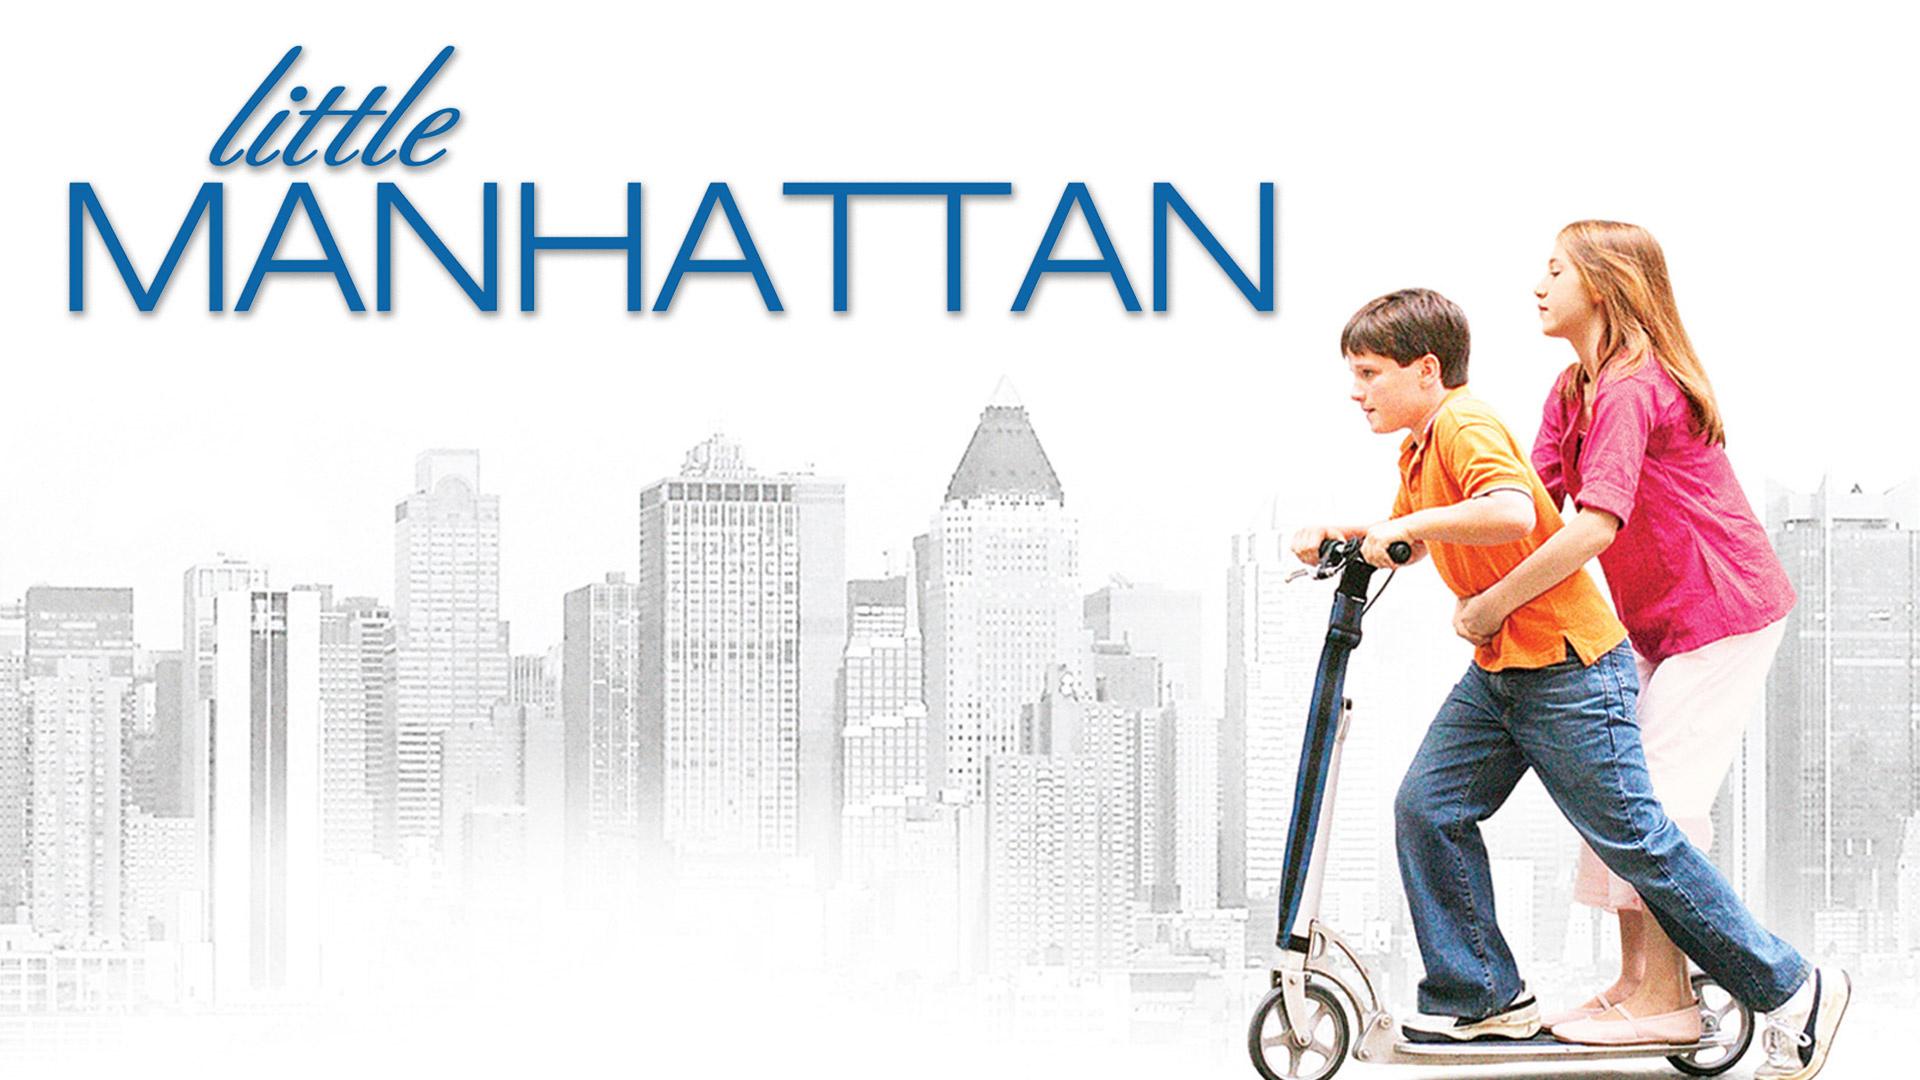 Little Manhattan (字幕版)